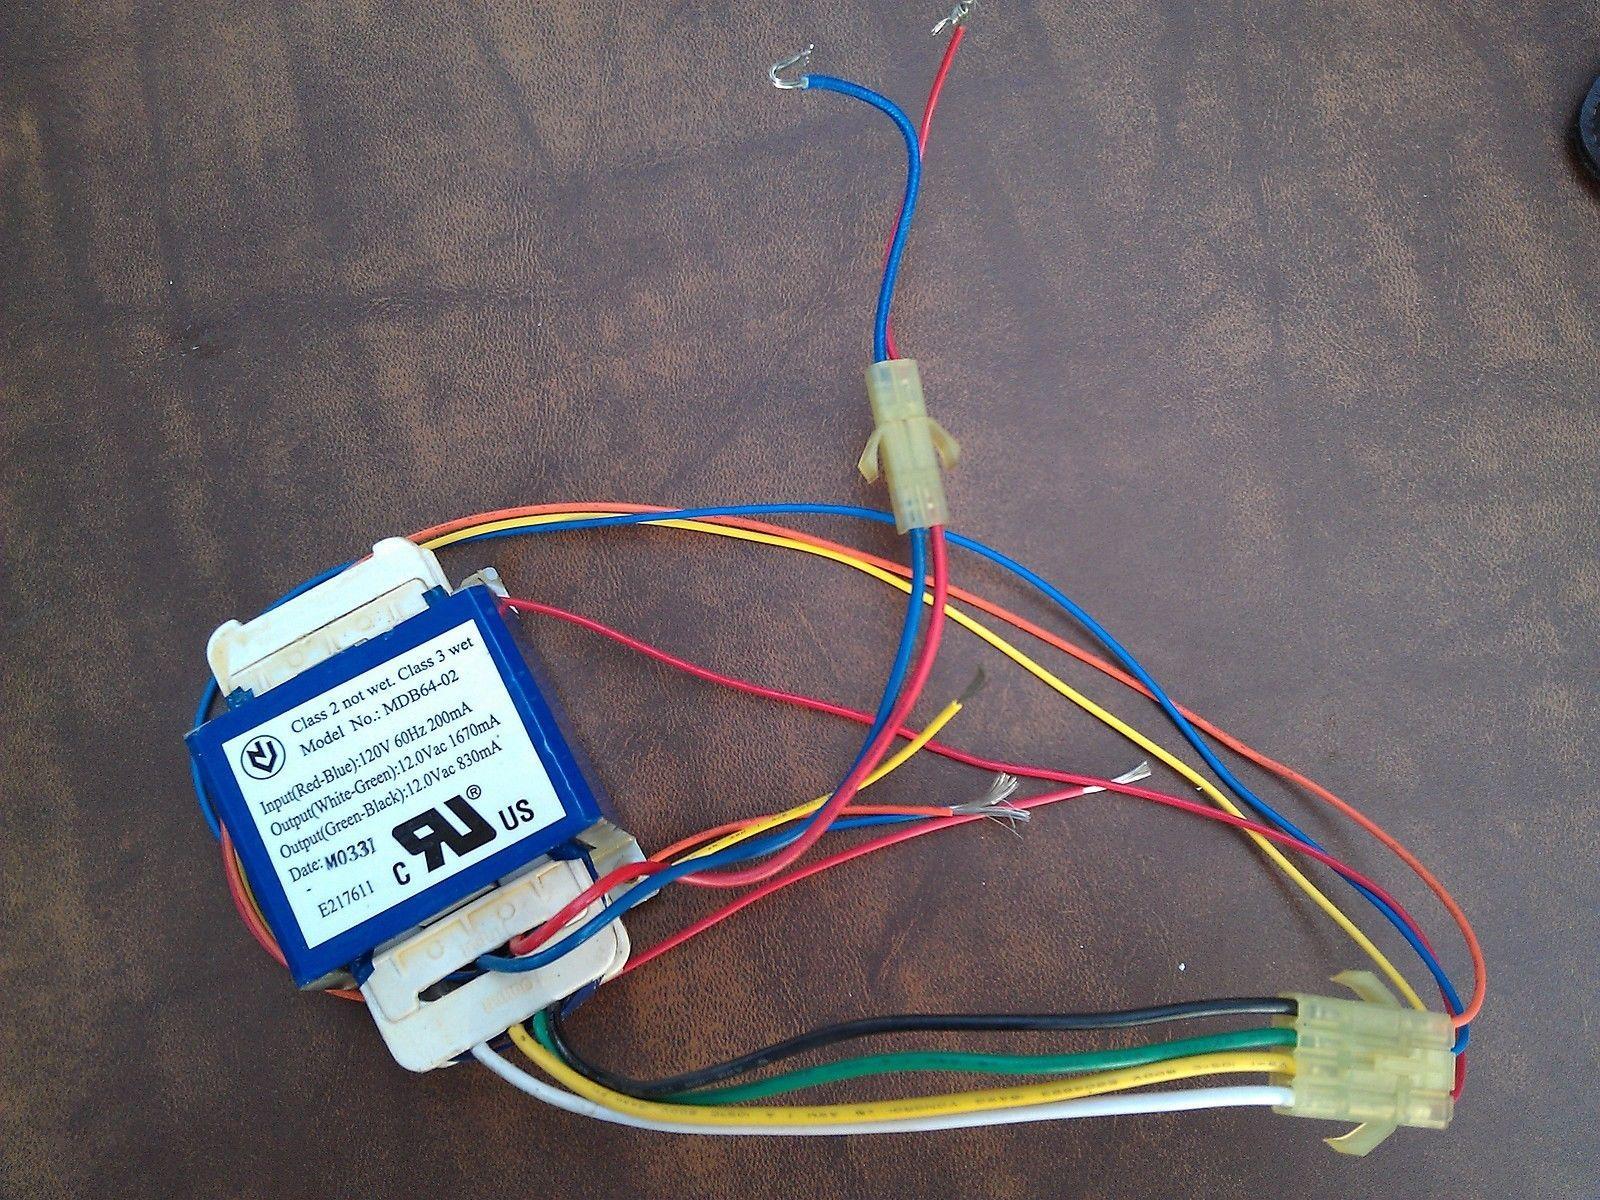 7BBB80 Power Supply, 120VAC --> 12VAC, 1 6A and 50 similar items